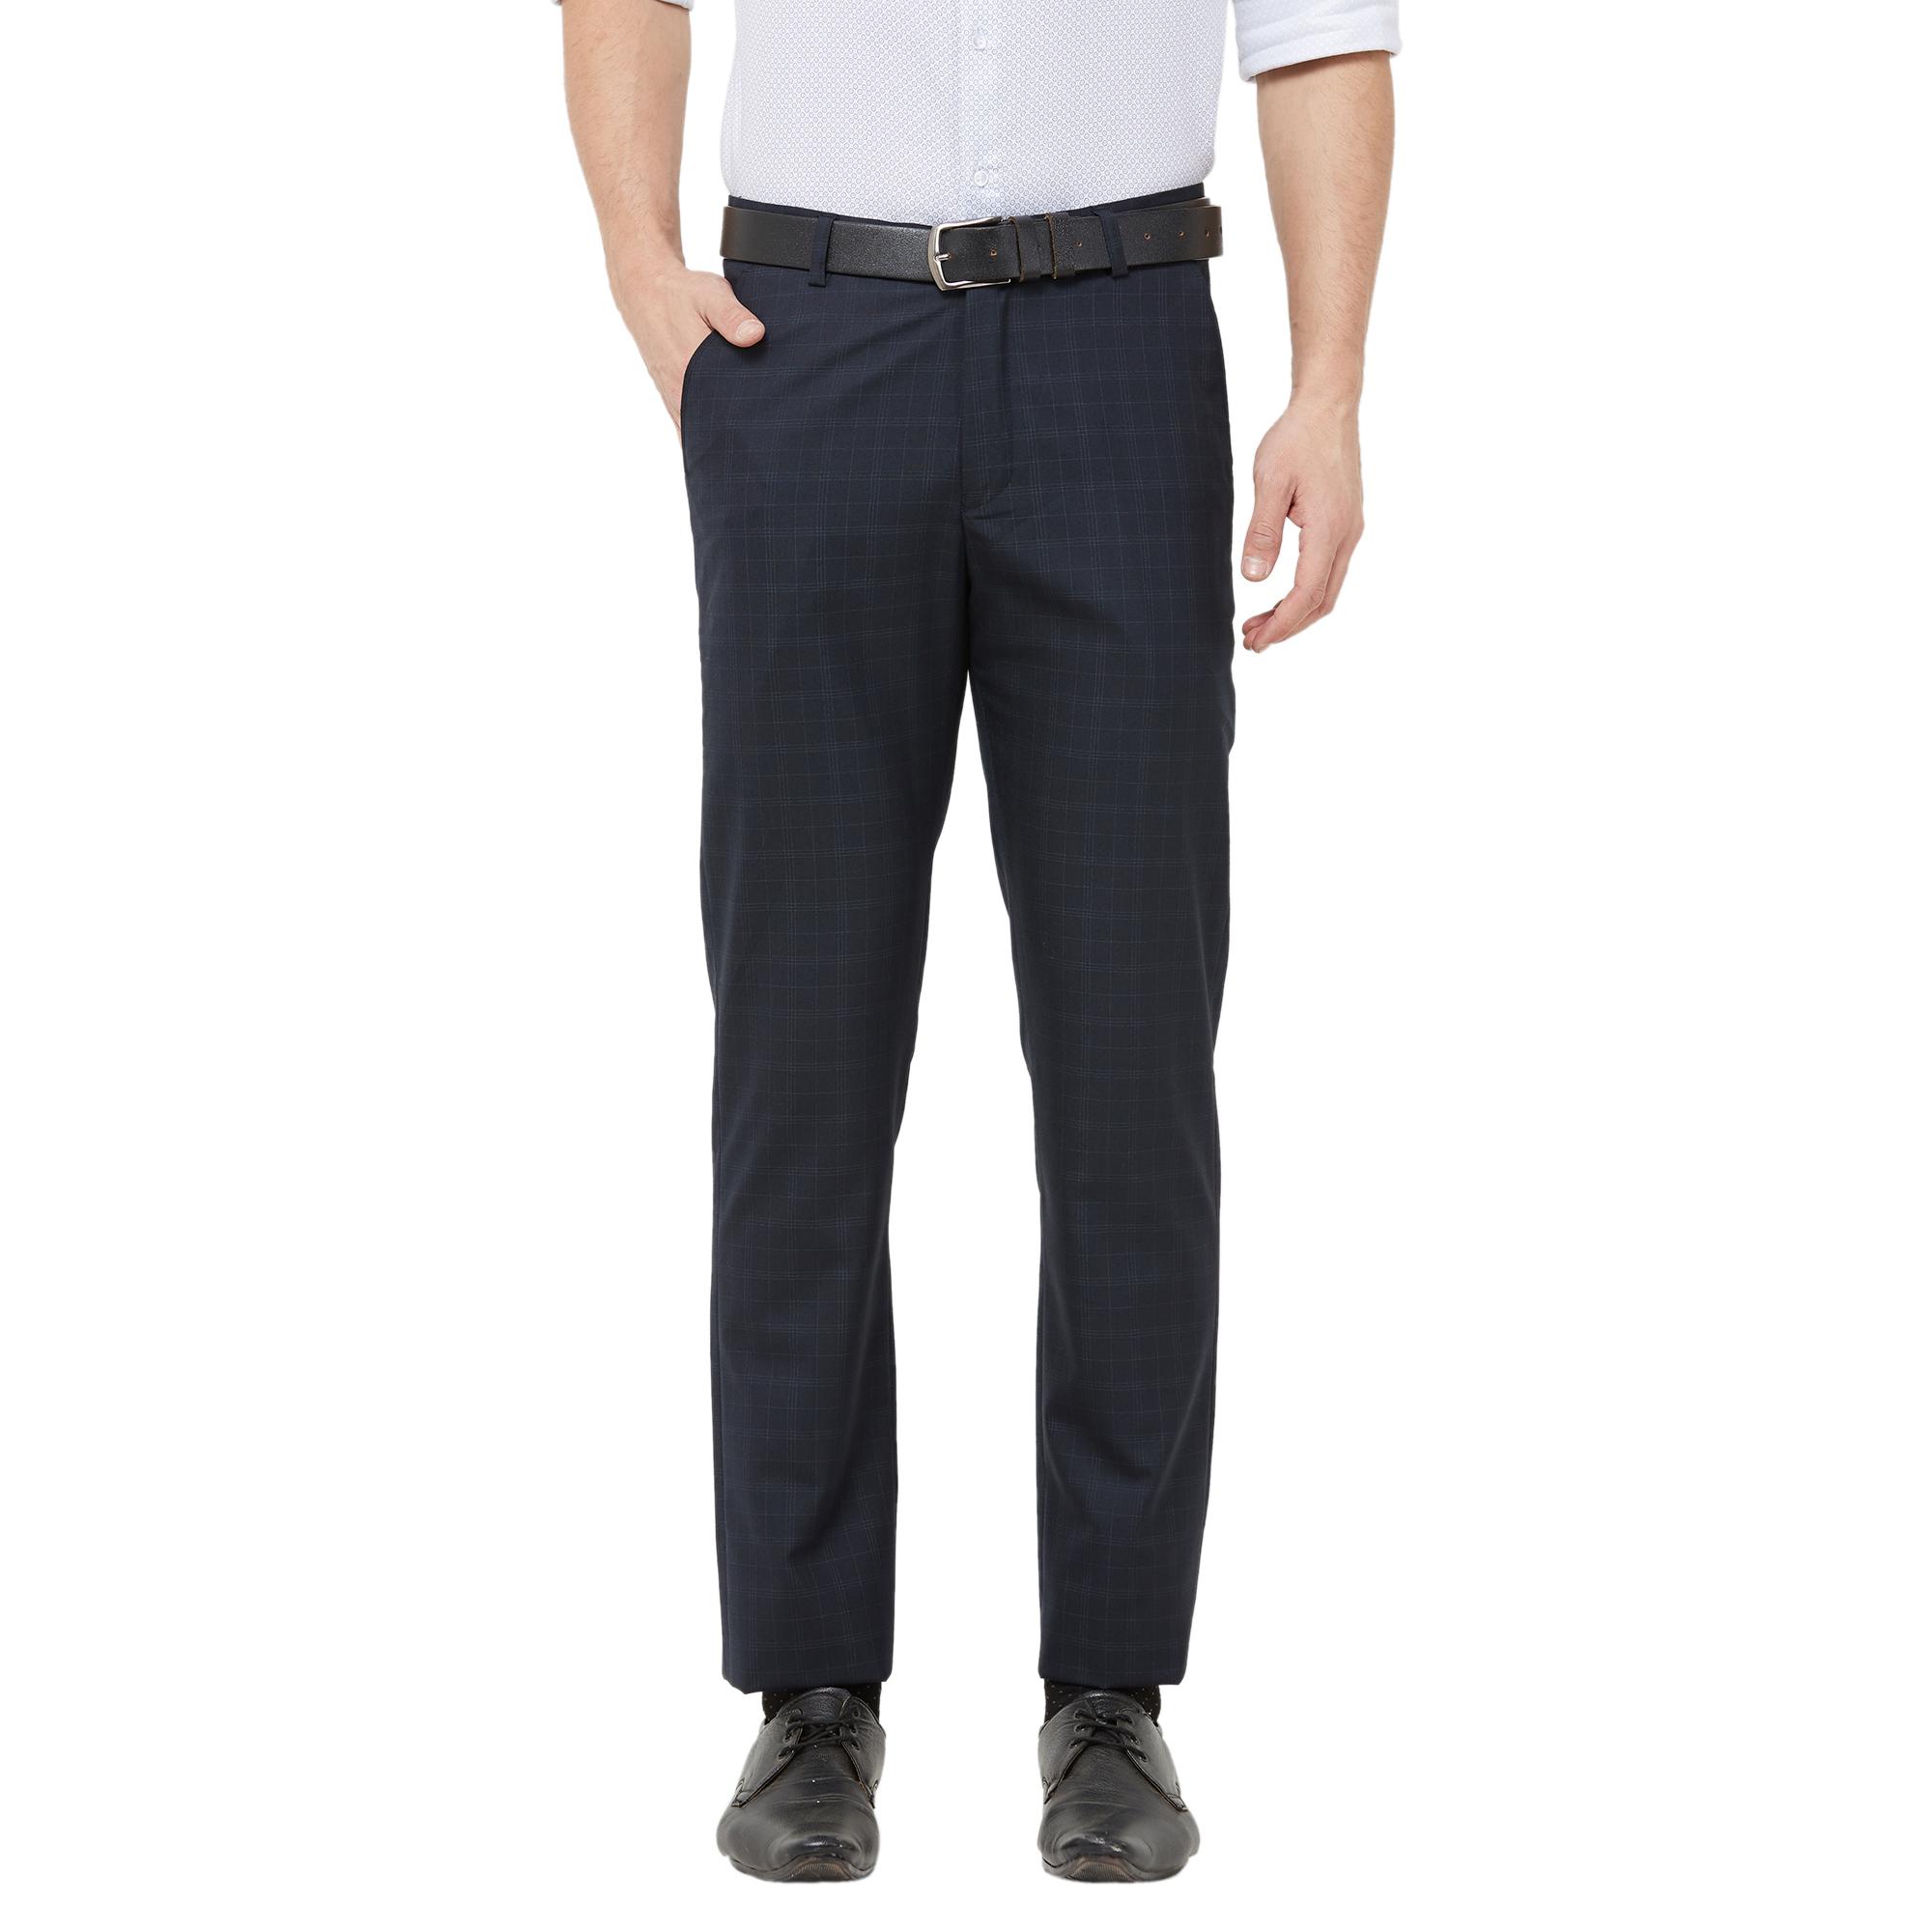 SOLEMIO | Solemio Poly Blend Checks Grey Trouser For Mens